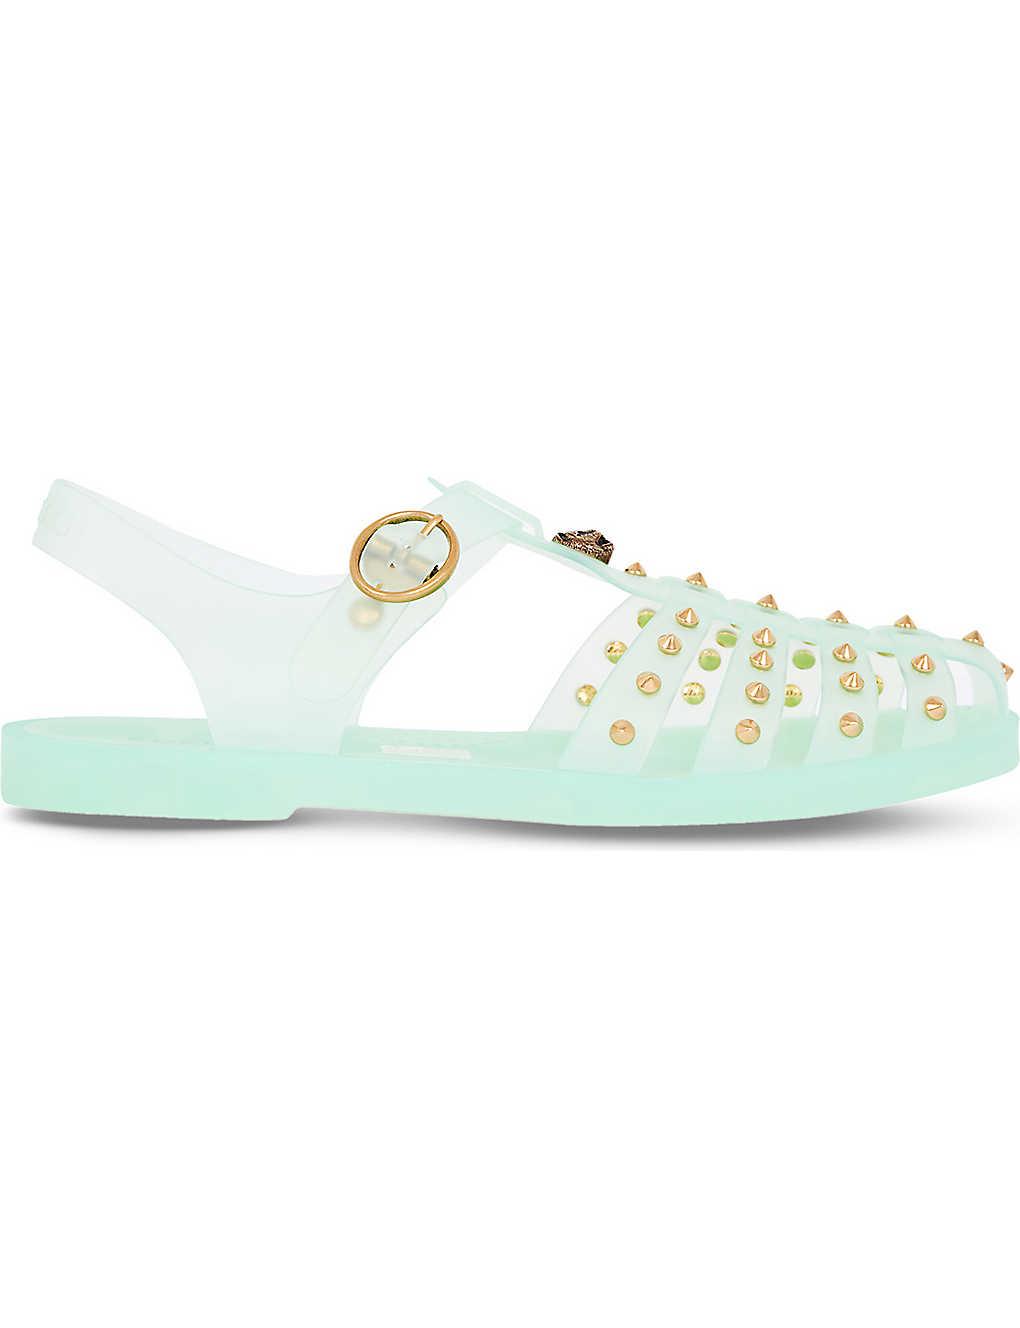 497251109 GUCCI - Glossy stud jelly sandals | Selfridges.com